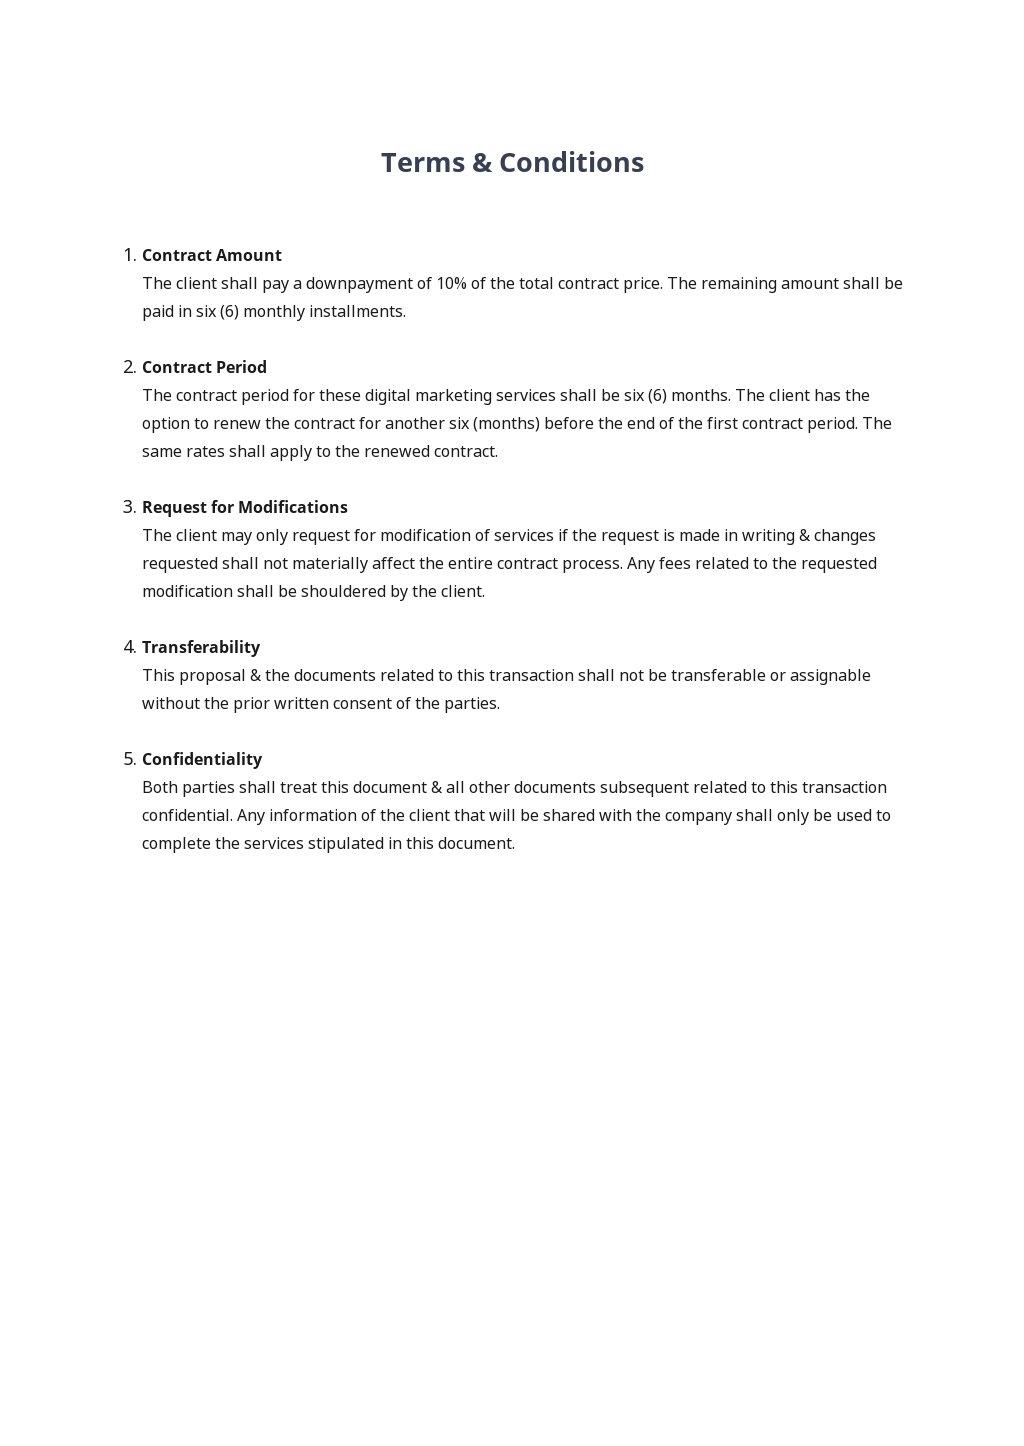 Sample Proposal Template 5.jpe